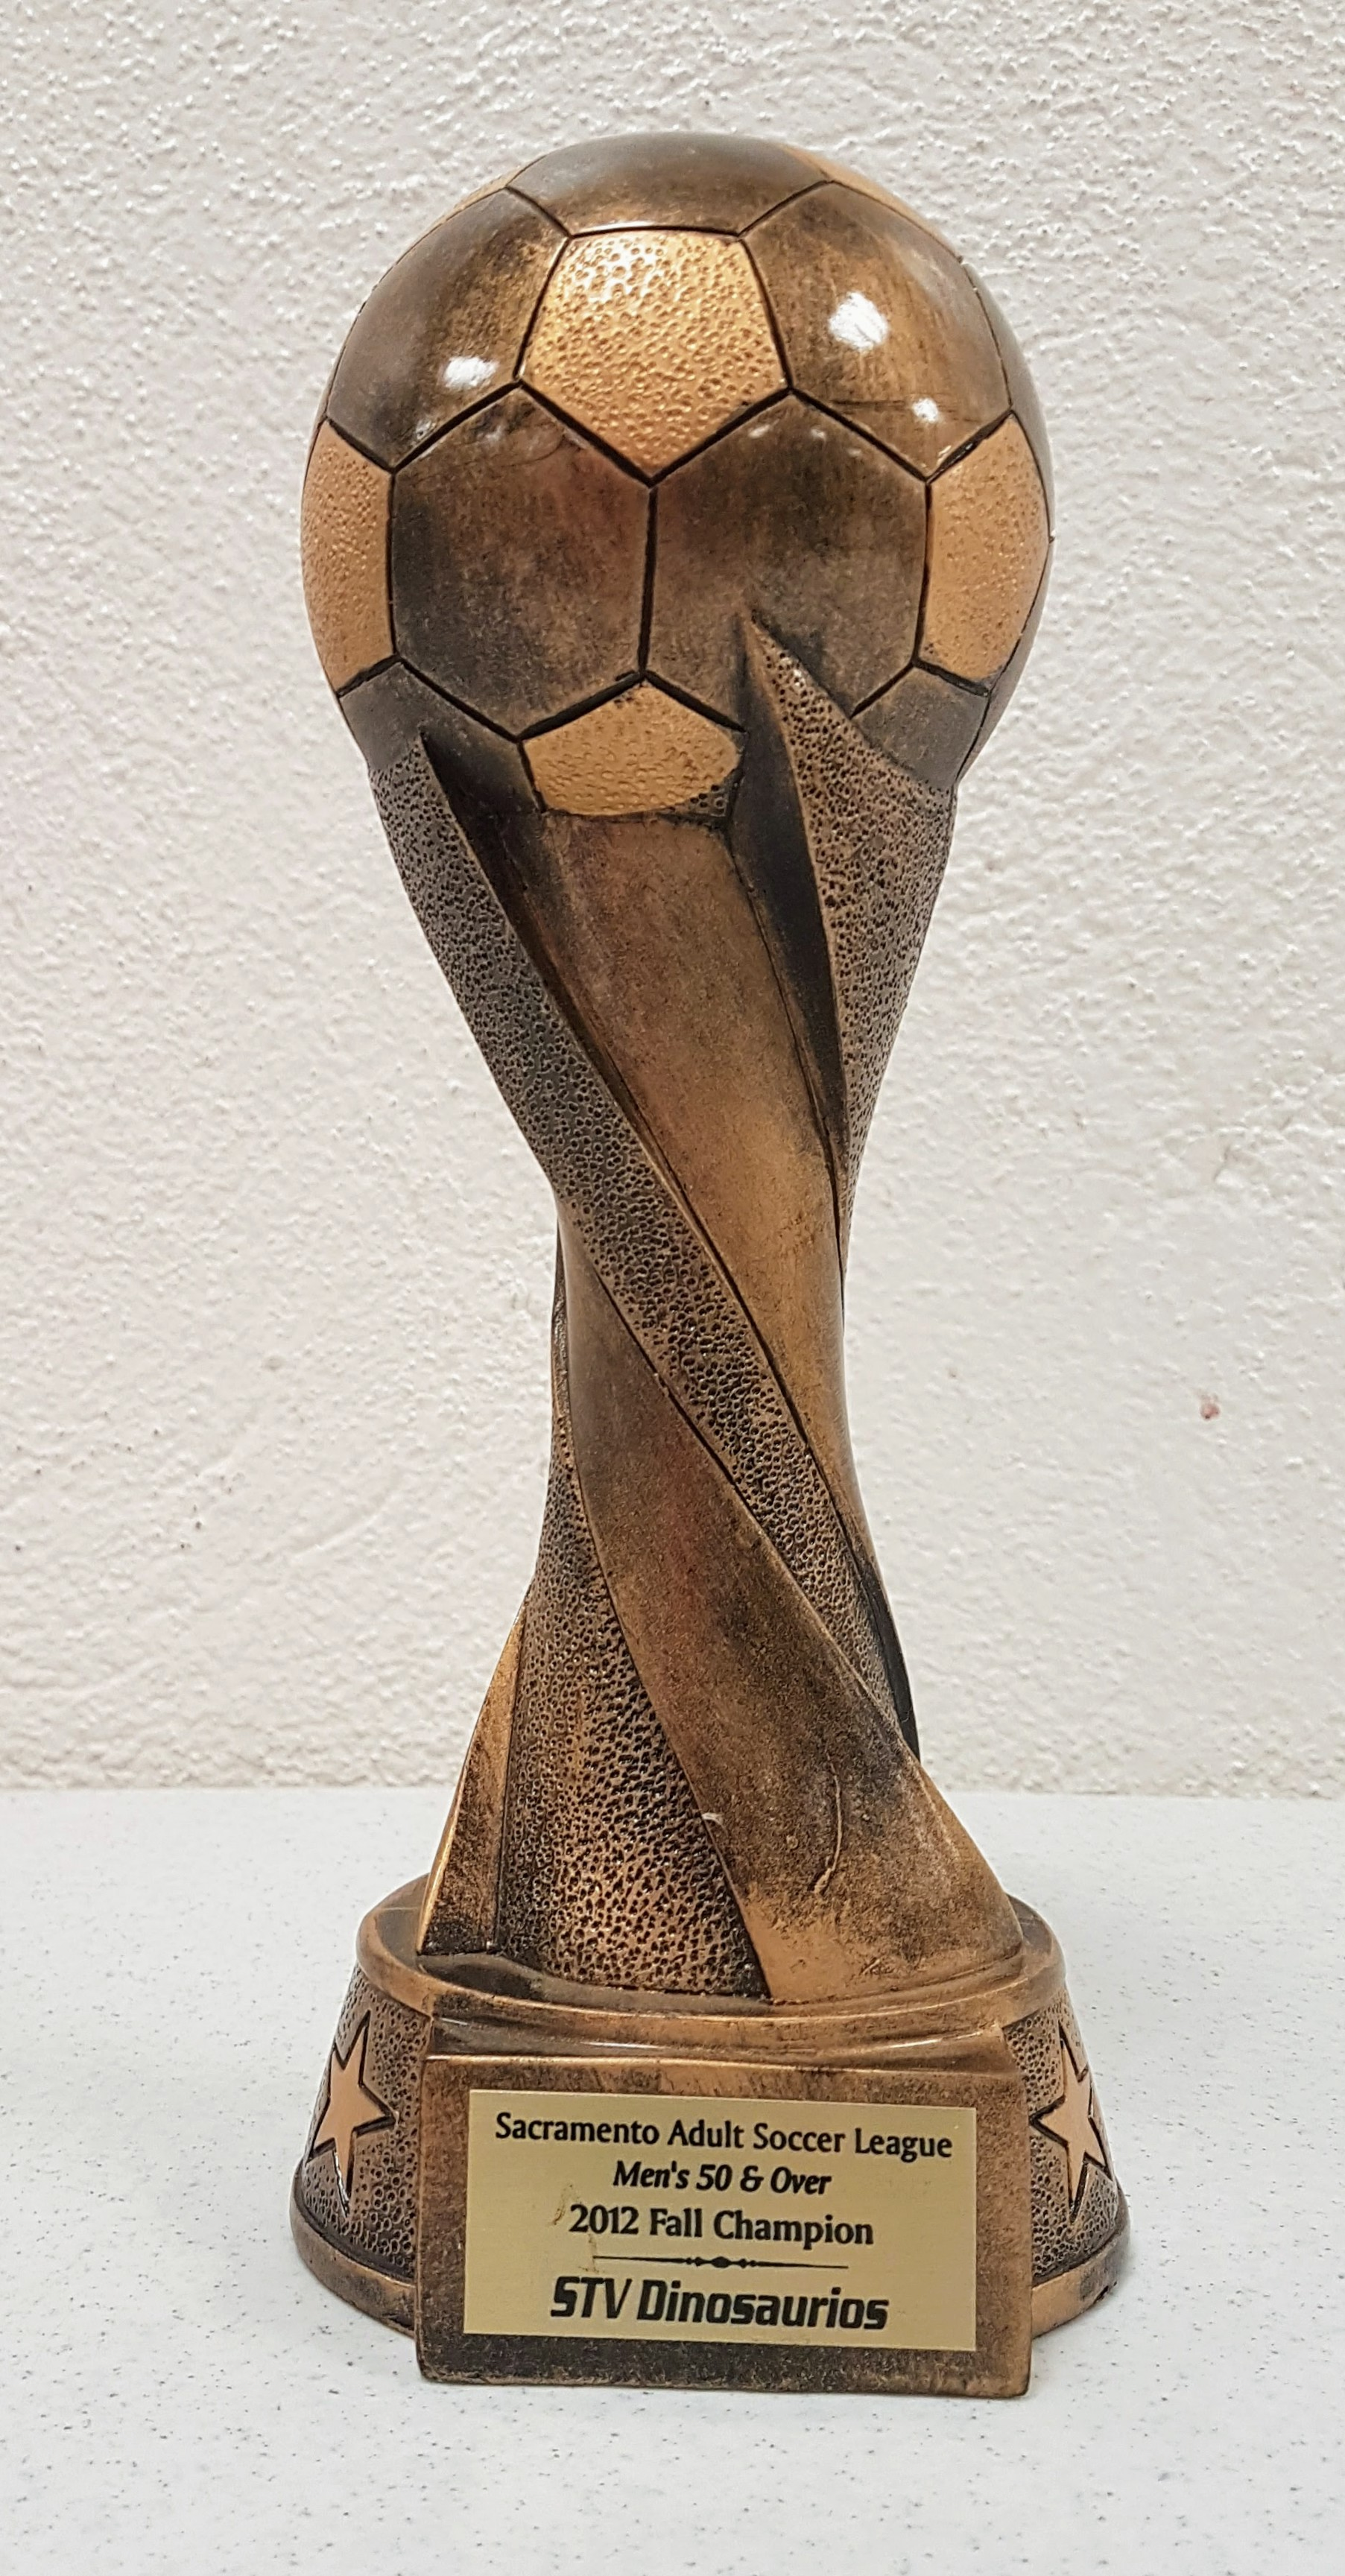 Opinion adult soccer sacramento agree, very